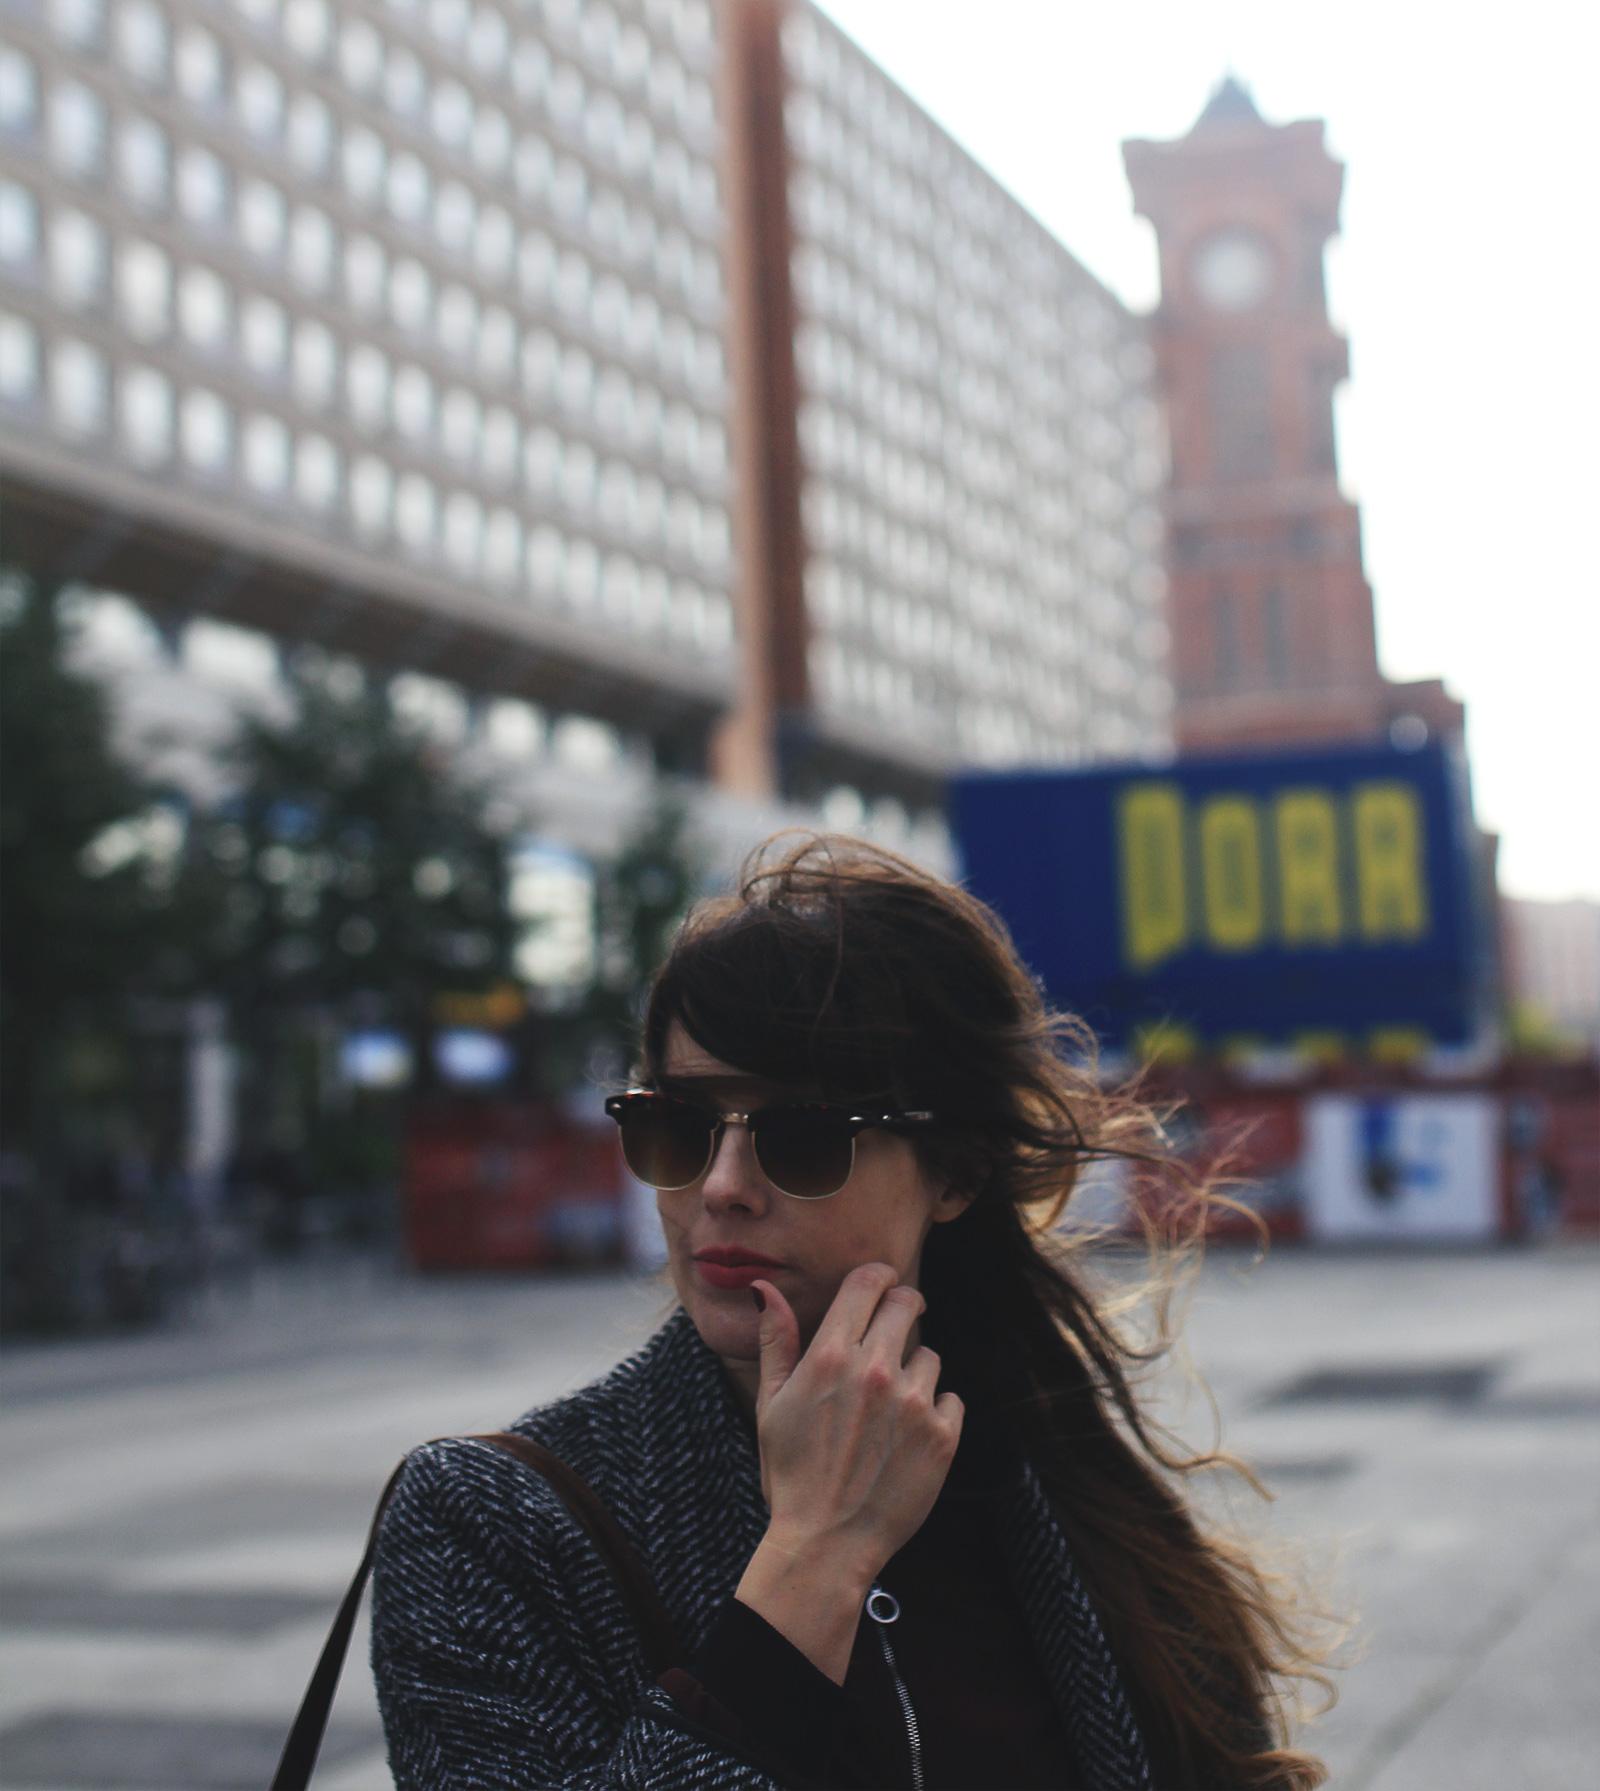 berlin-14okt-03